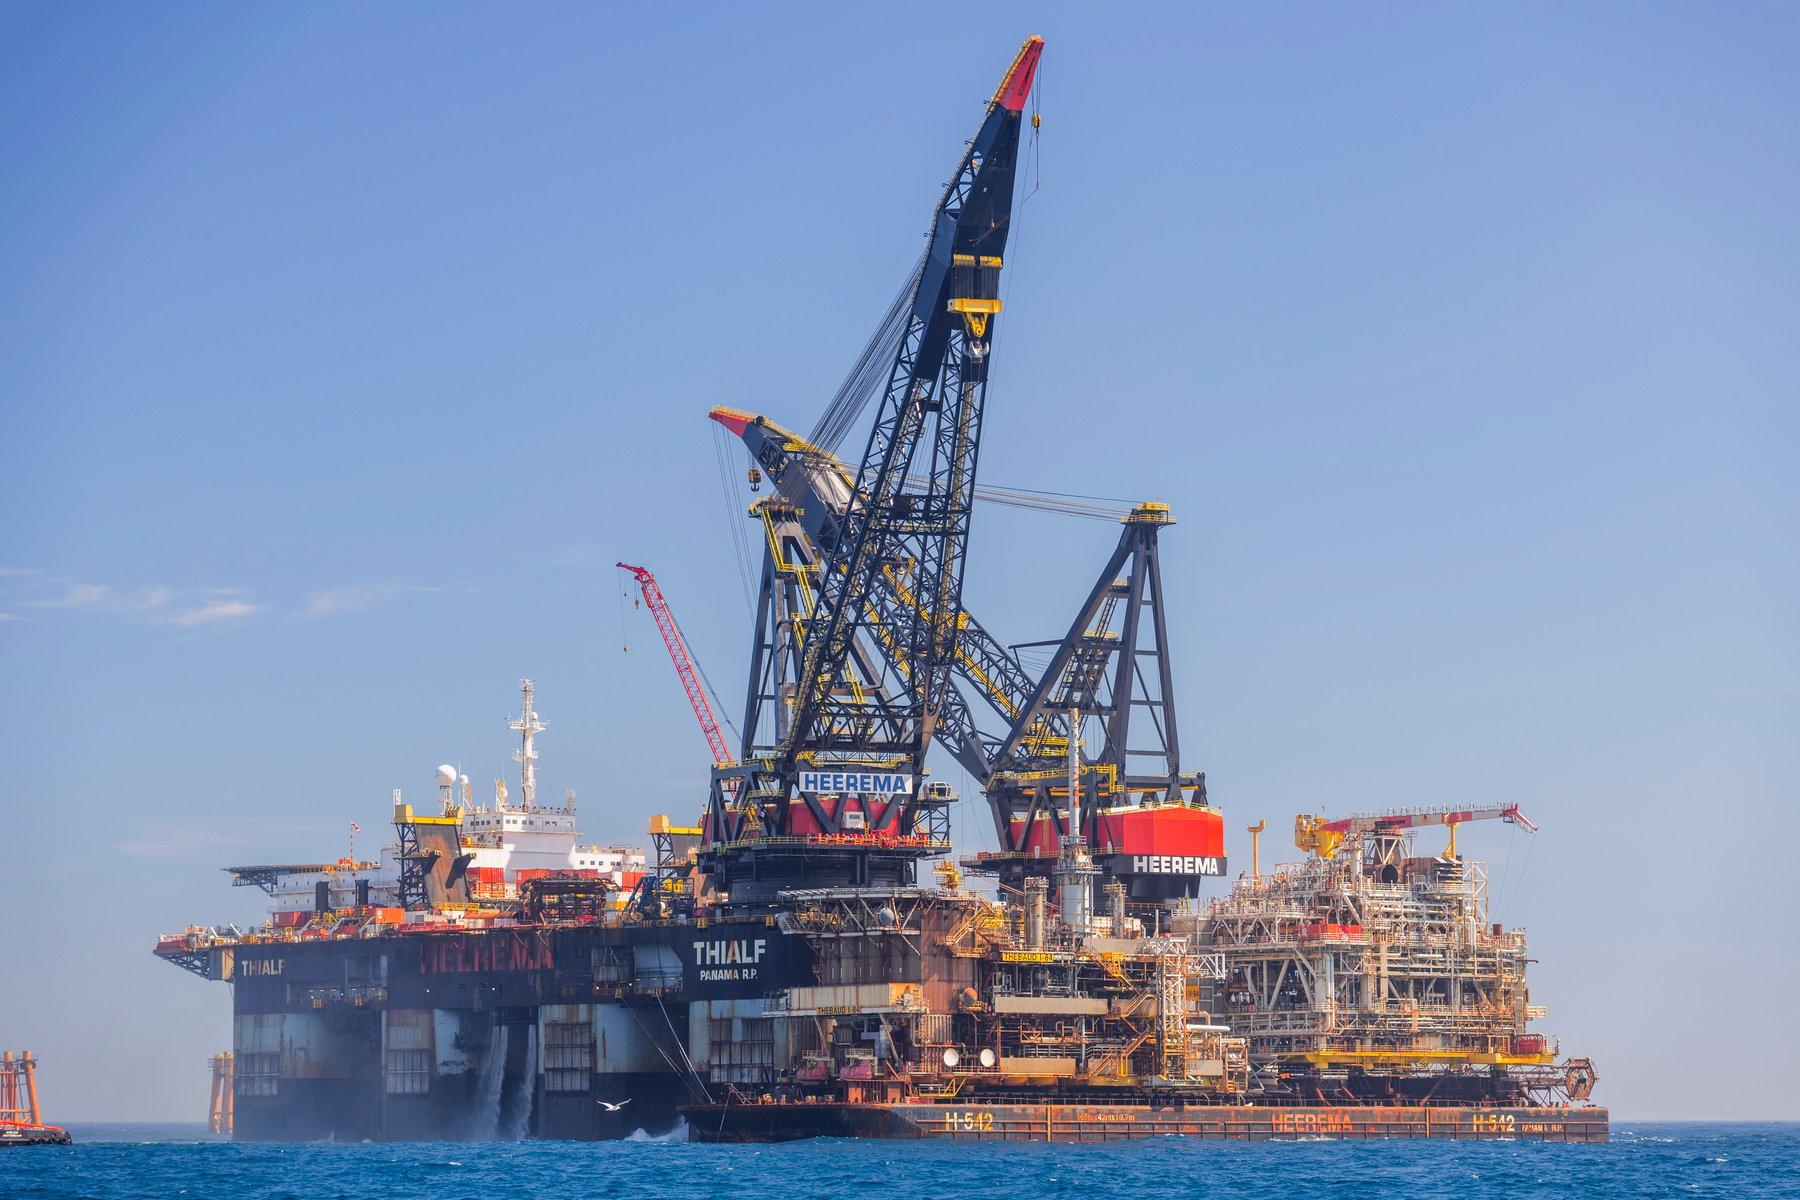 Sable Island Exxonmobil Heerema Thialf Decommissioning